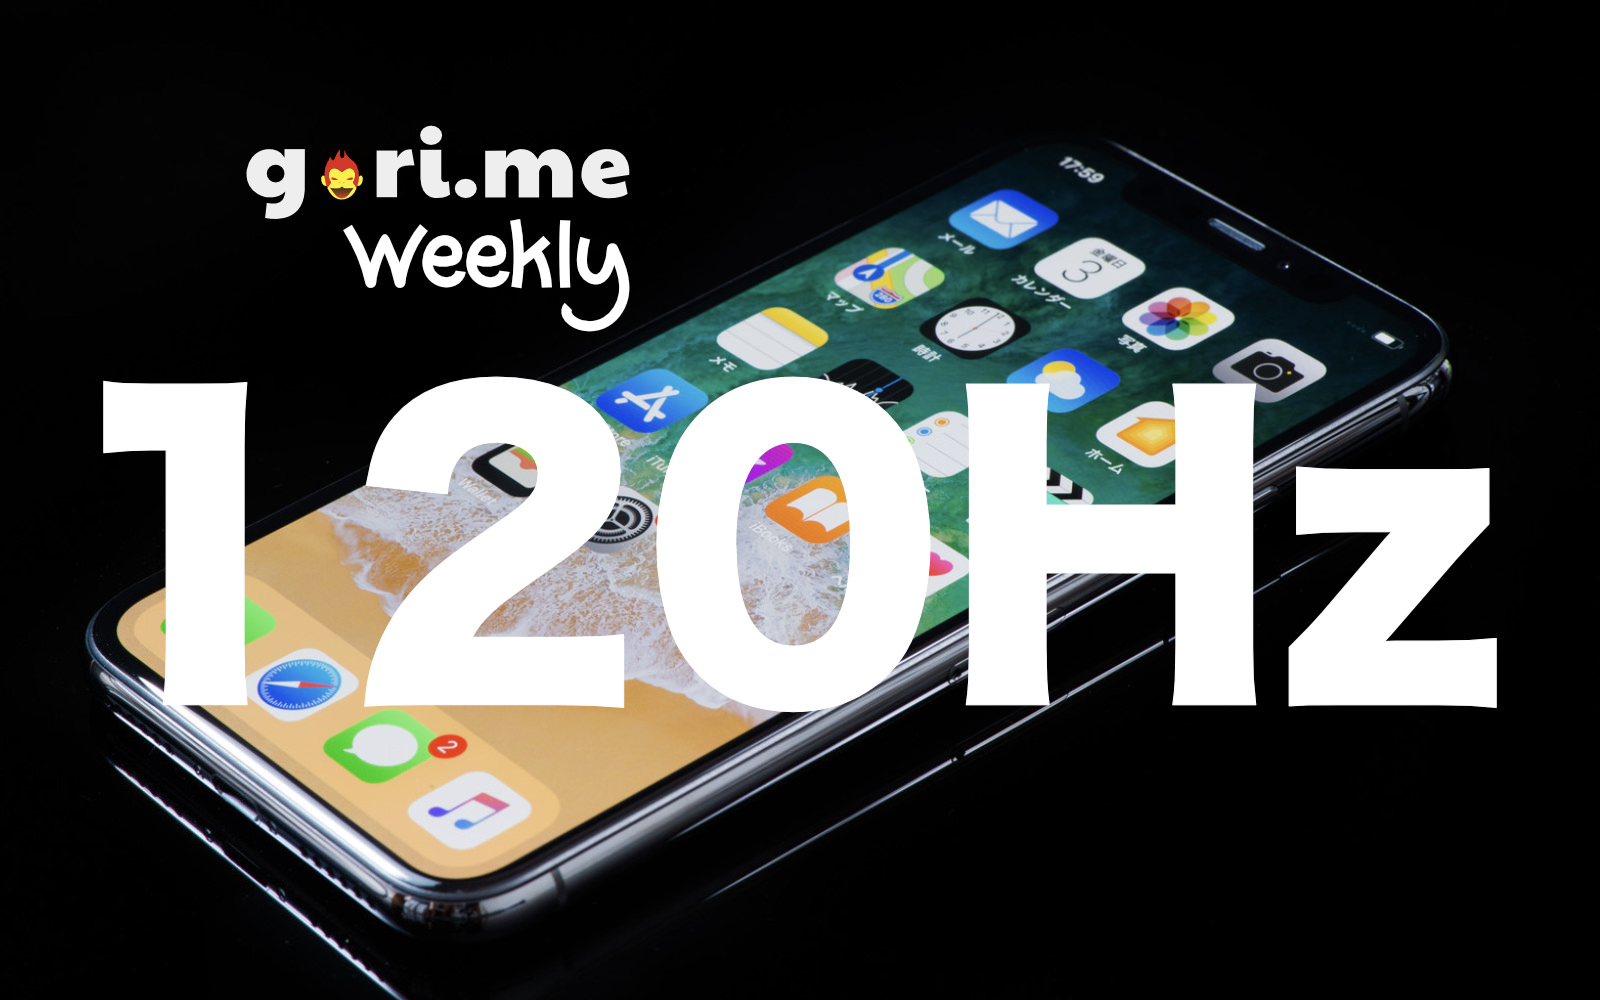 120hz gorime weekly